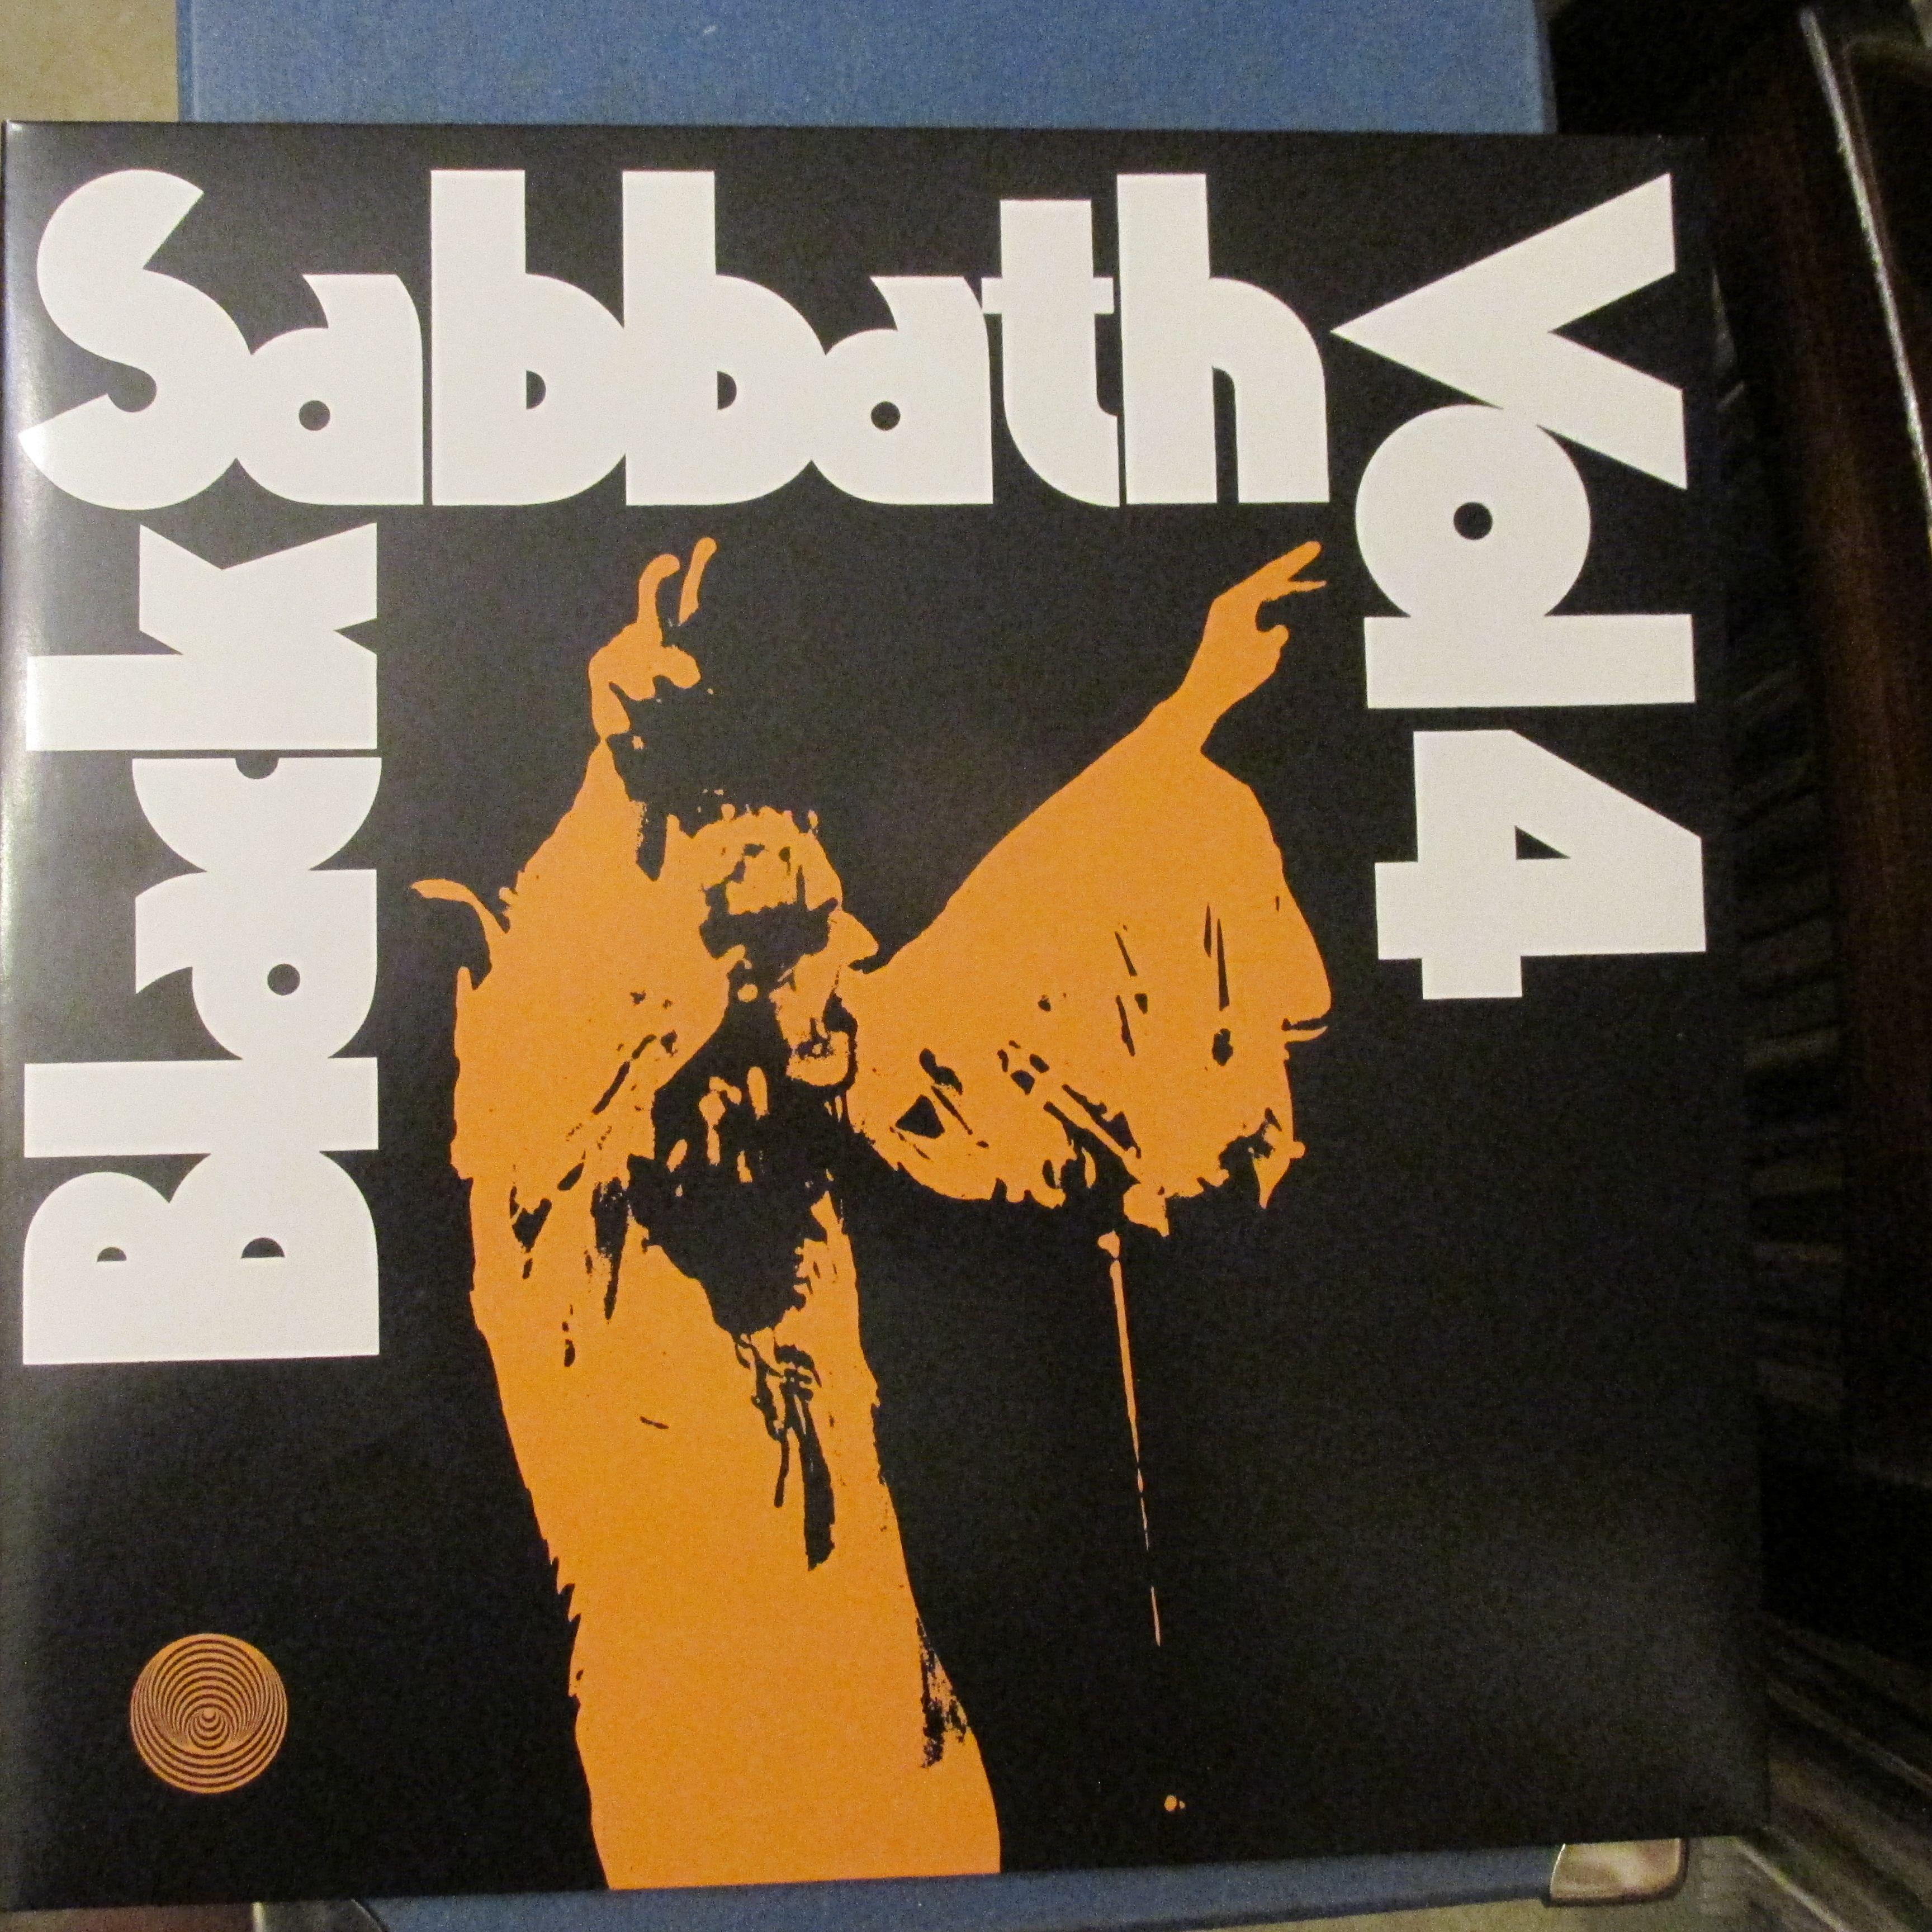 Black Sabbath Vol 4 LP undefined